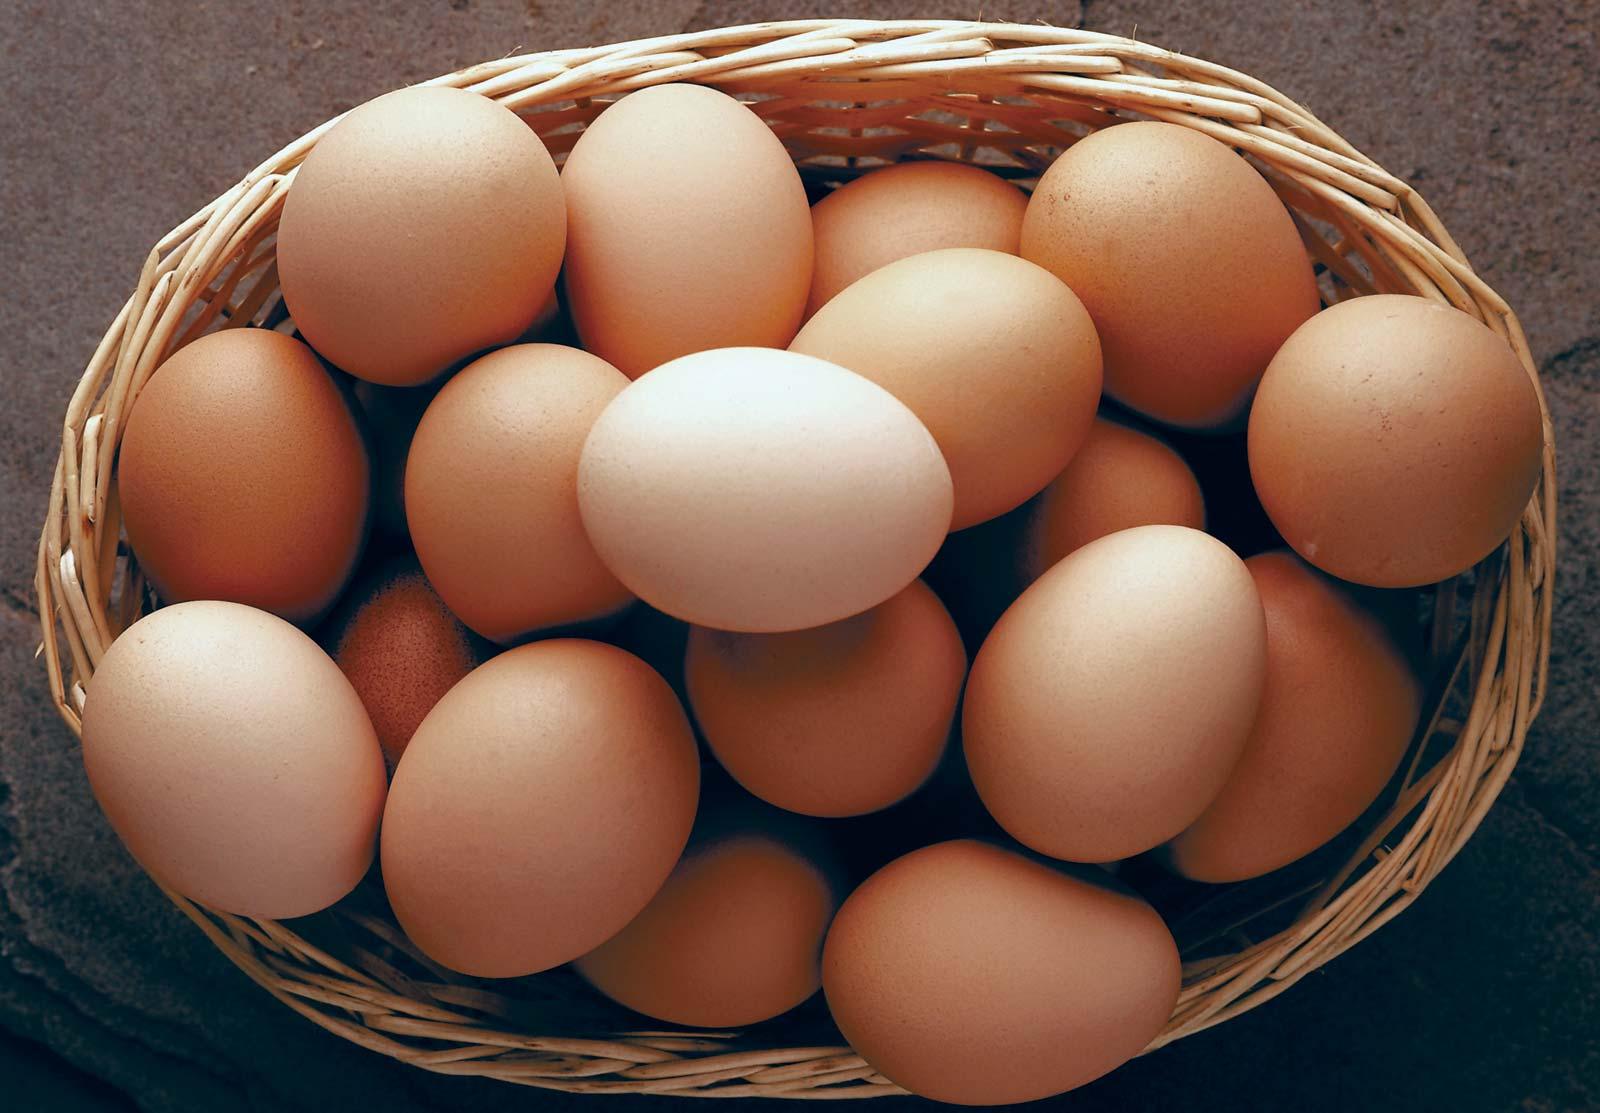 1-dz-small-eggs-free-range-chickens